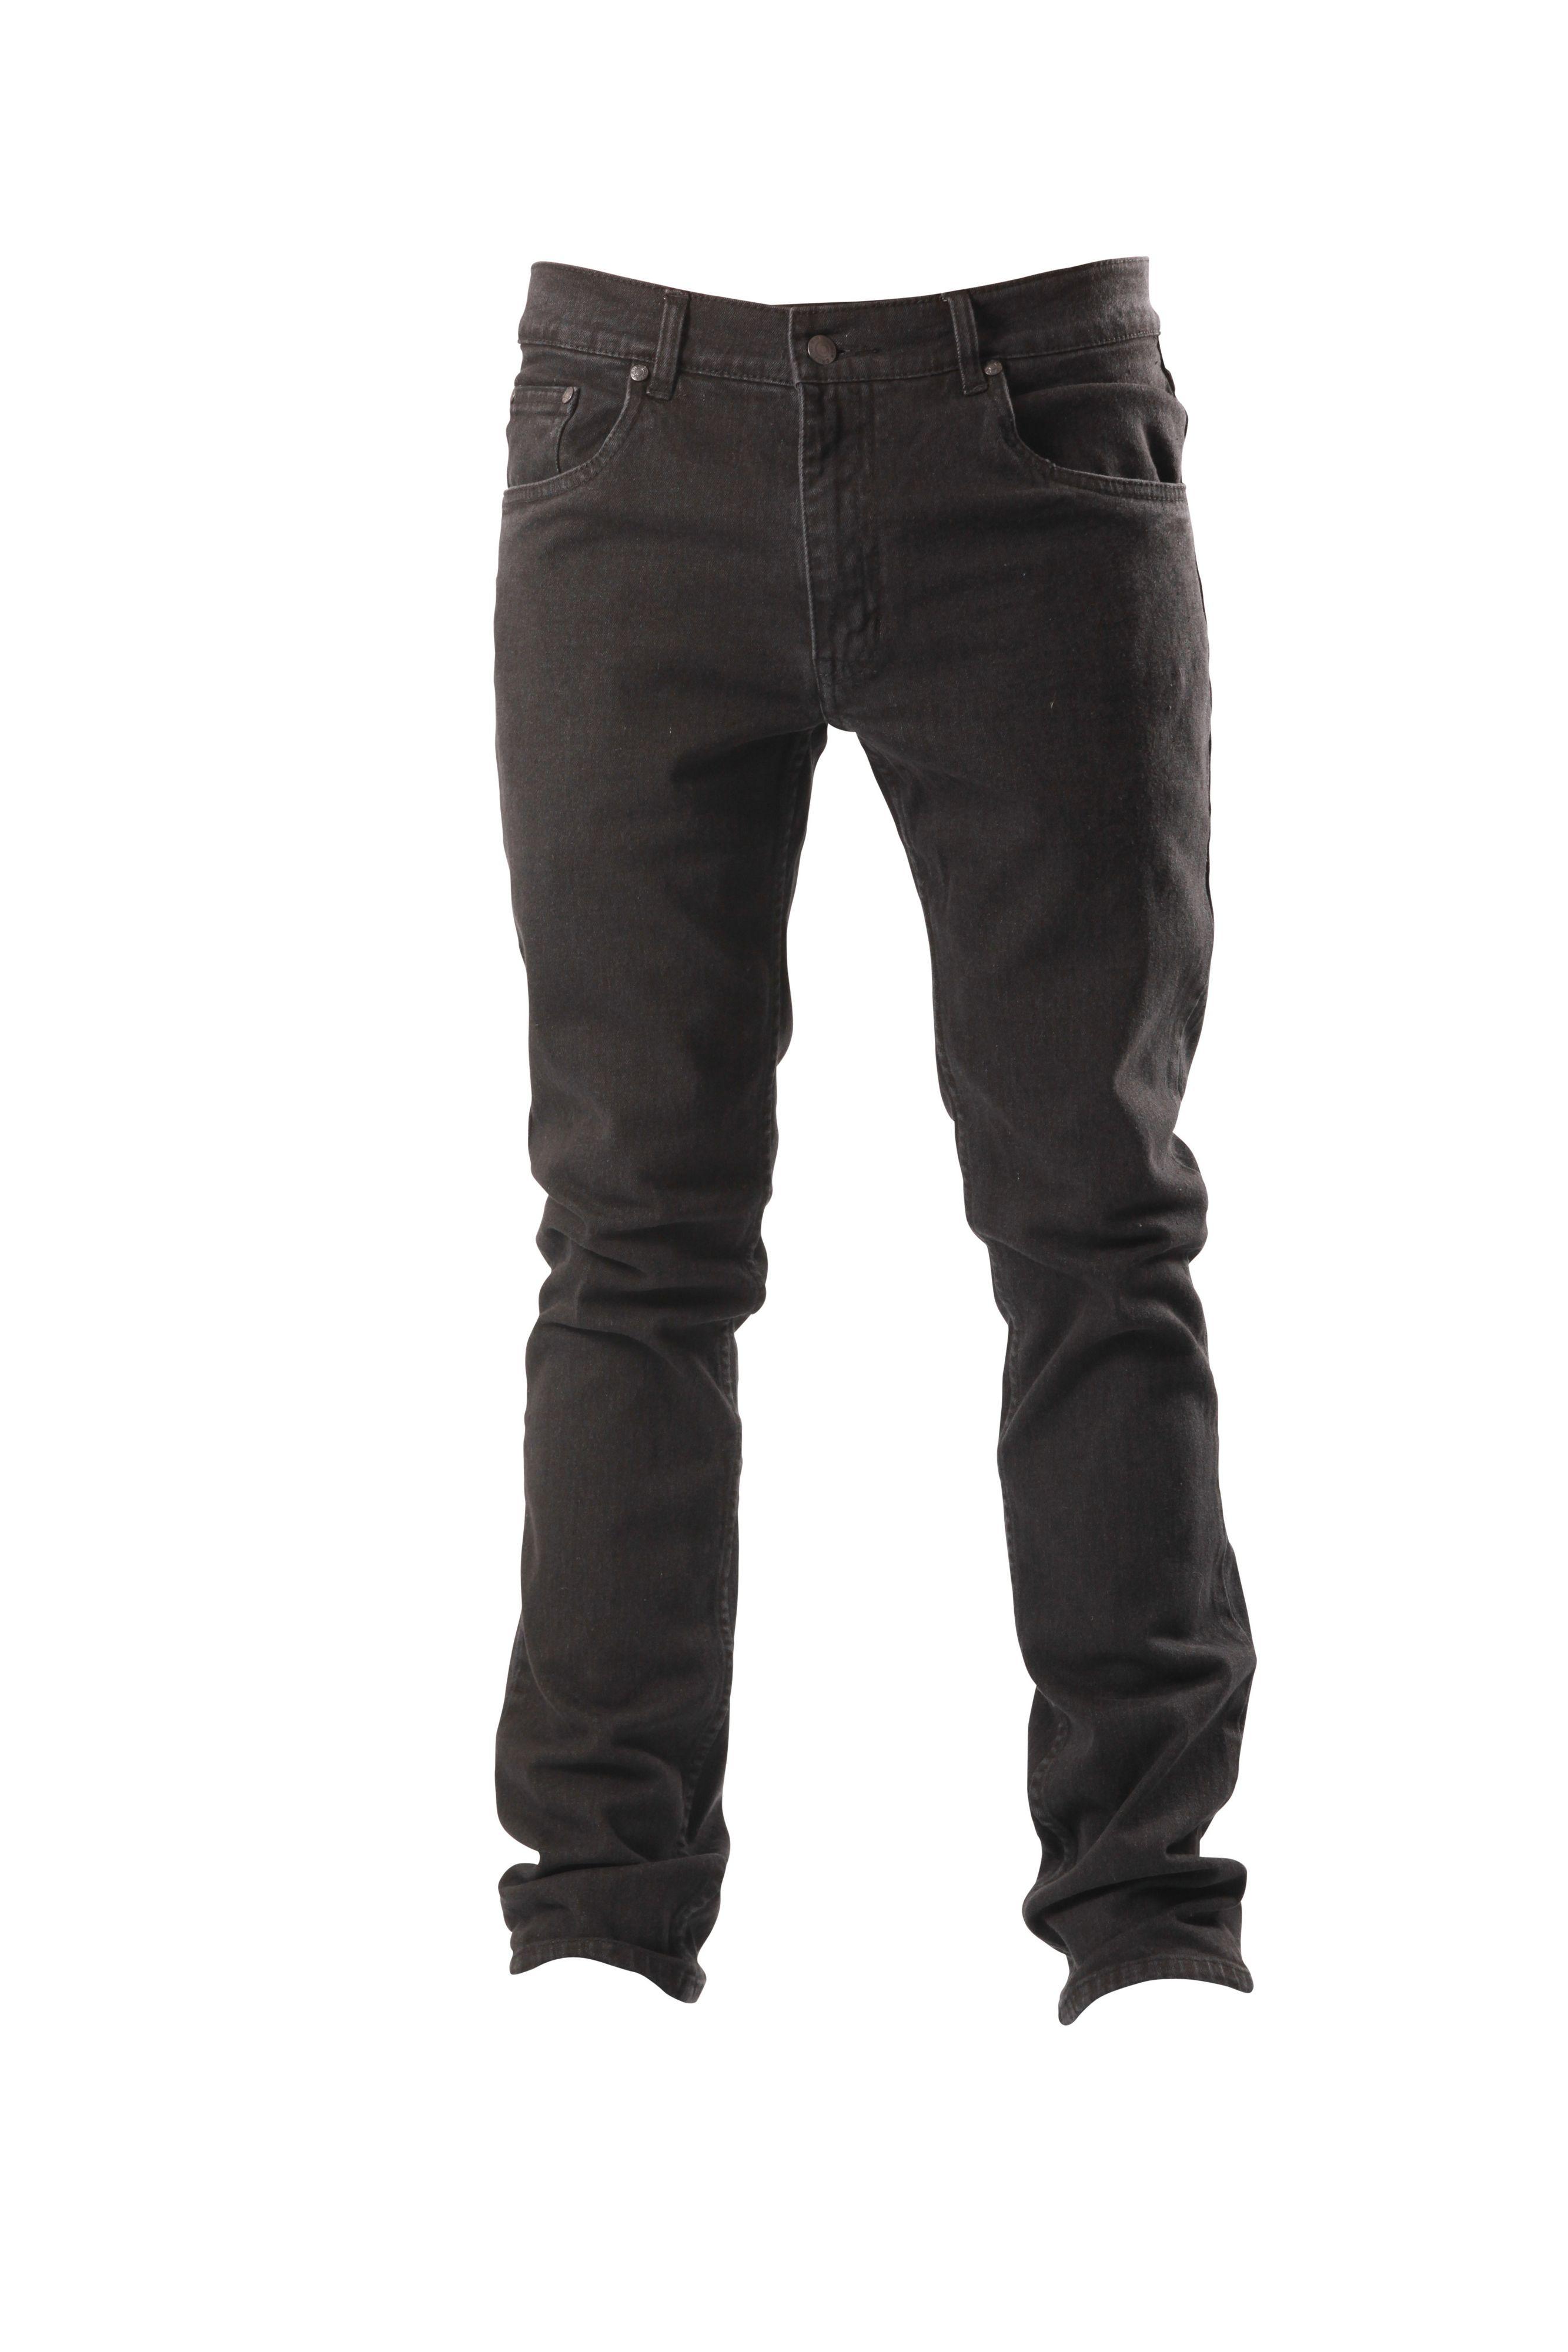 Santa Cruz Gutter Jeans in Black for Men